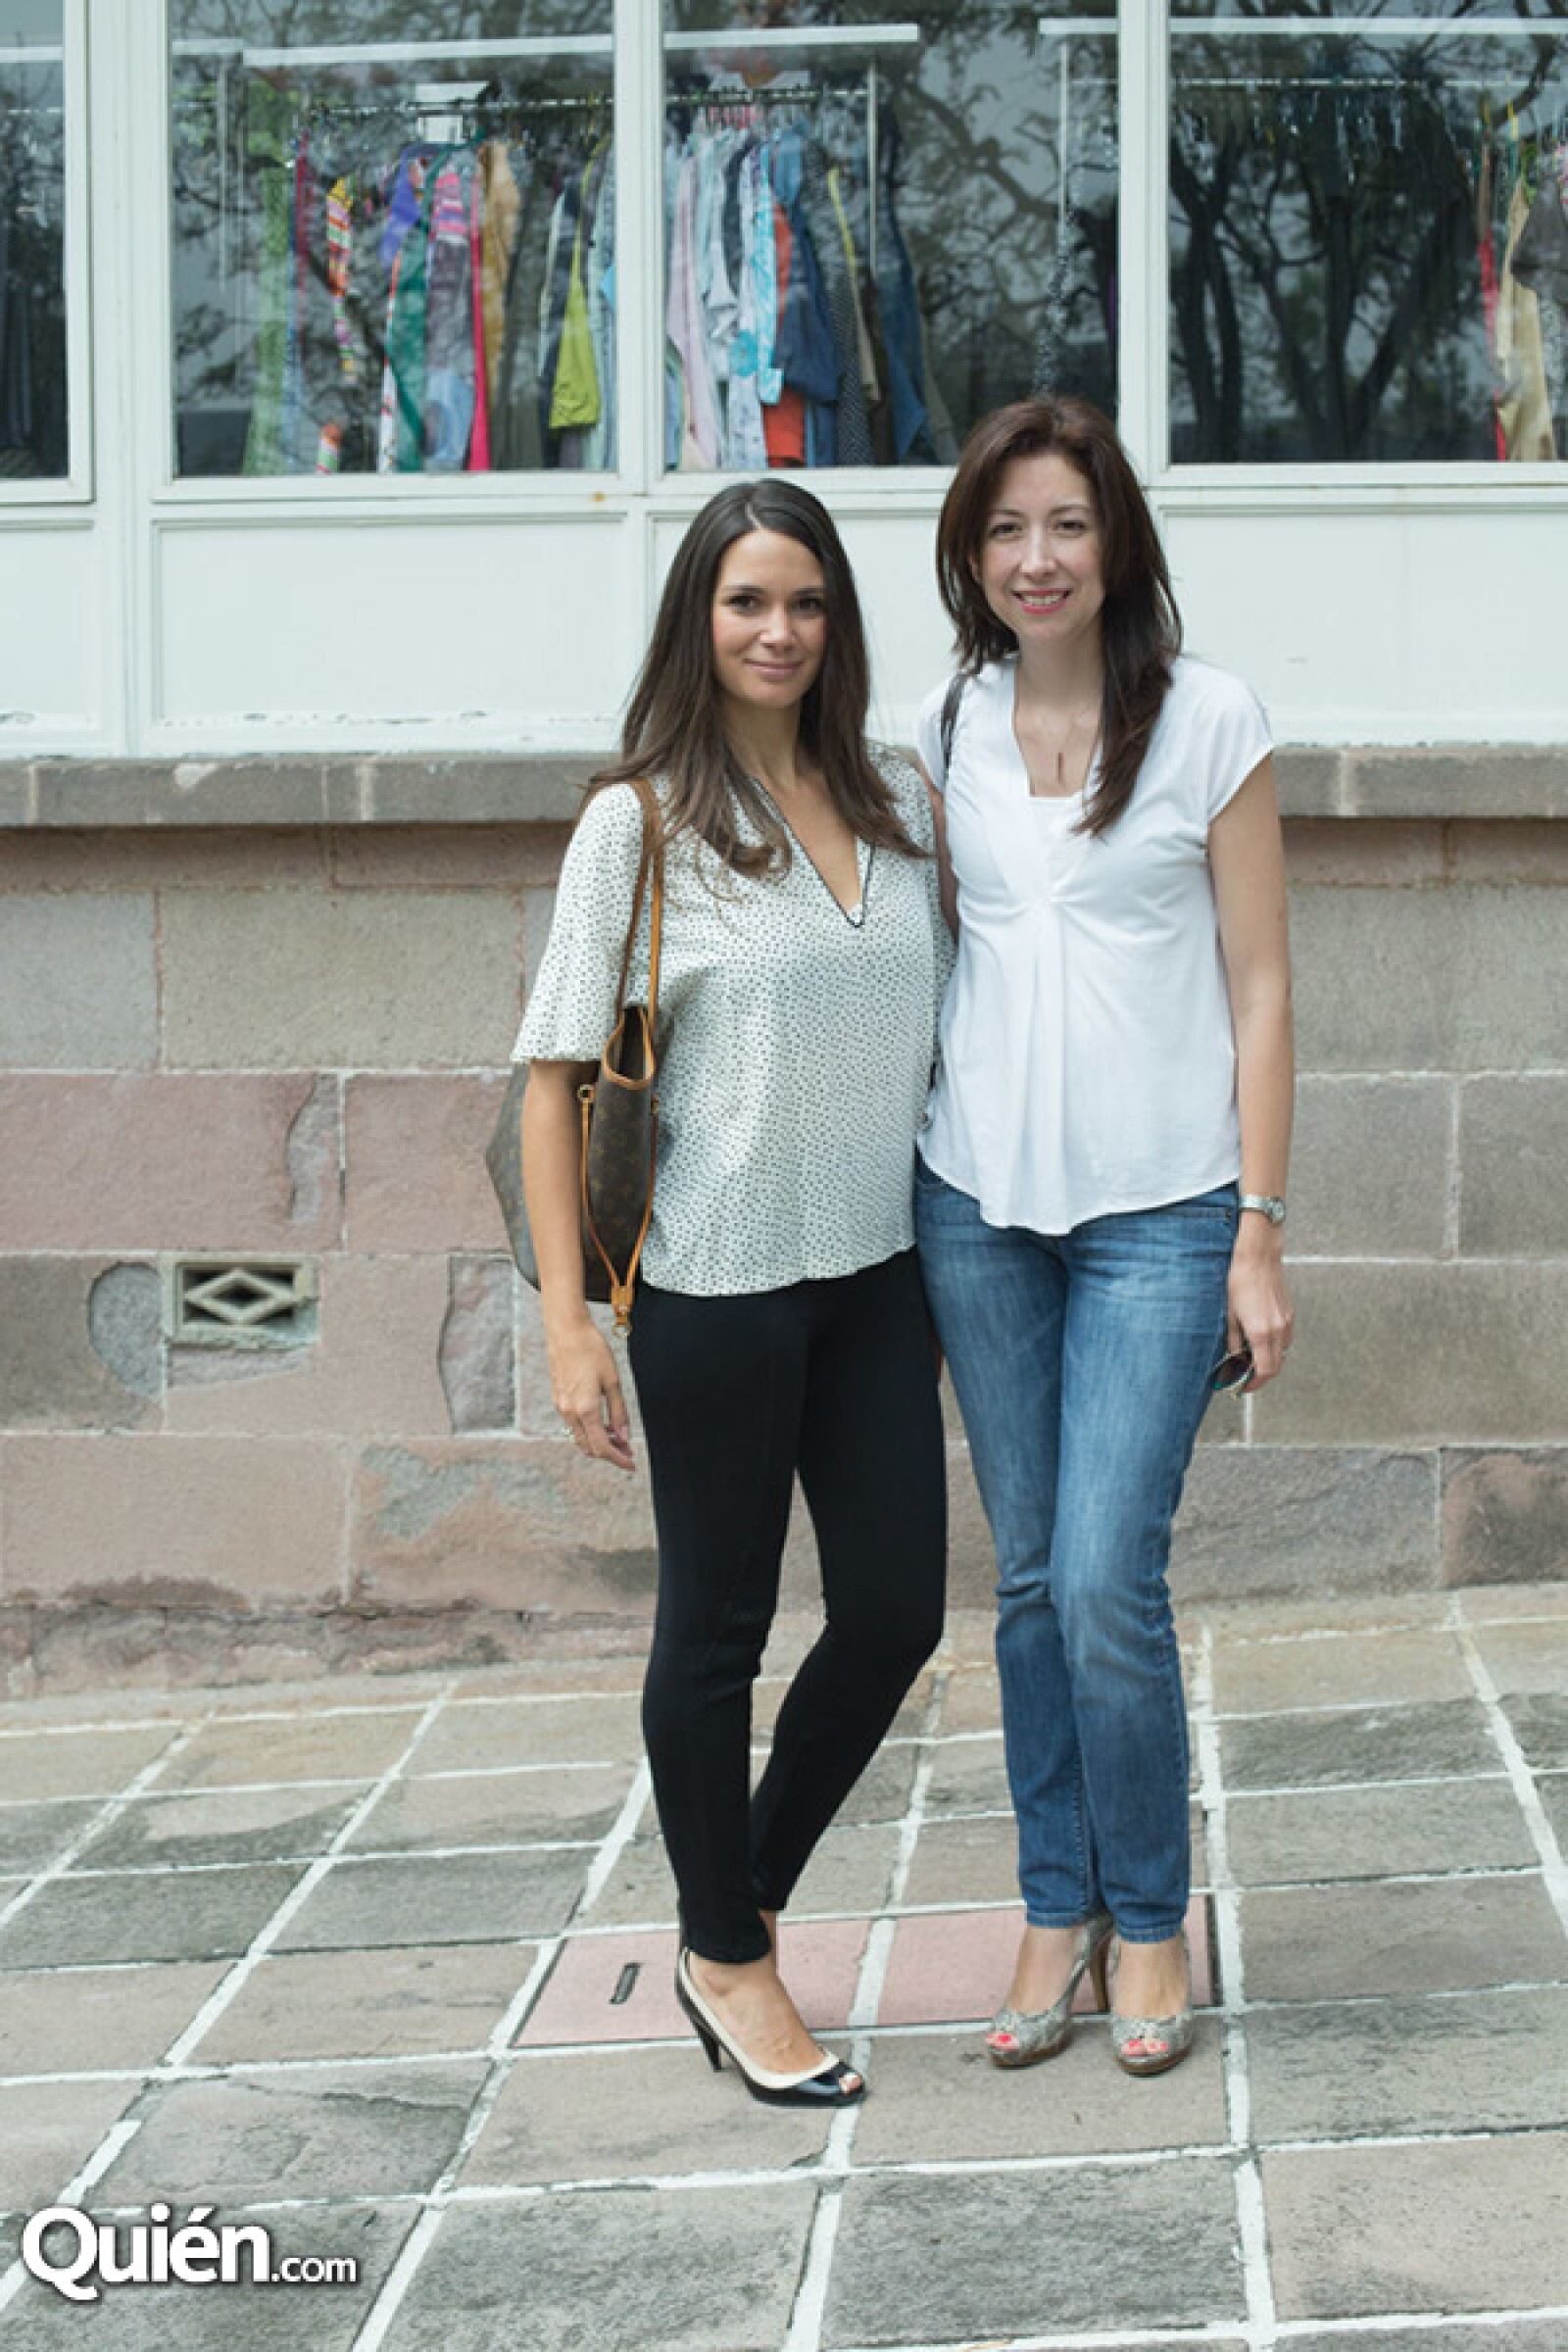 Agustina Vázquez y Silvia Carrillo